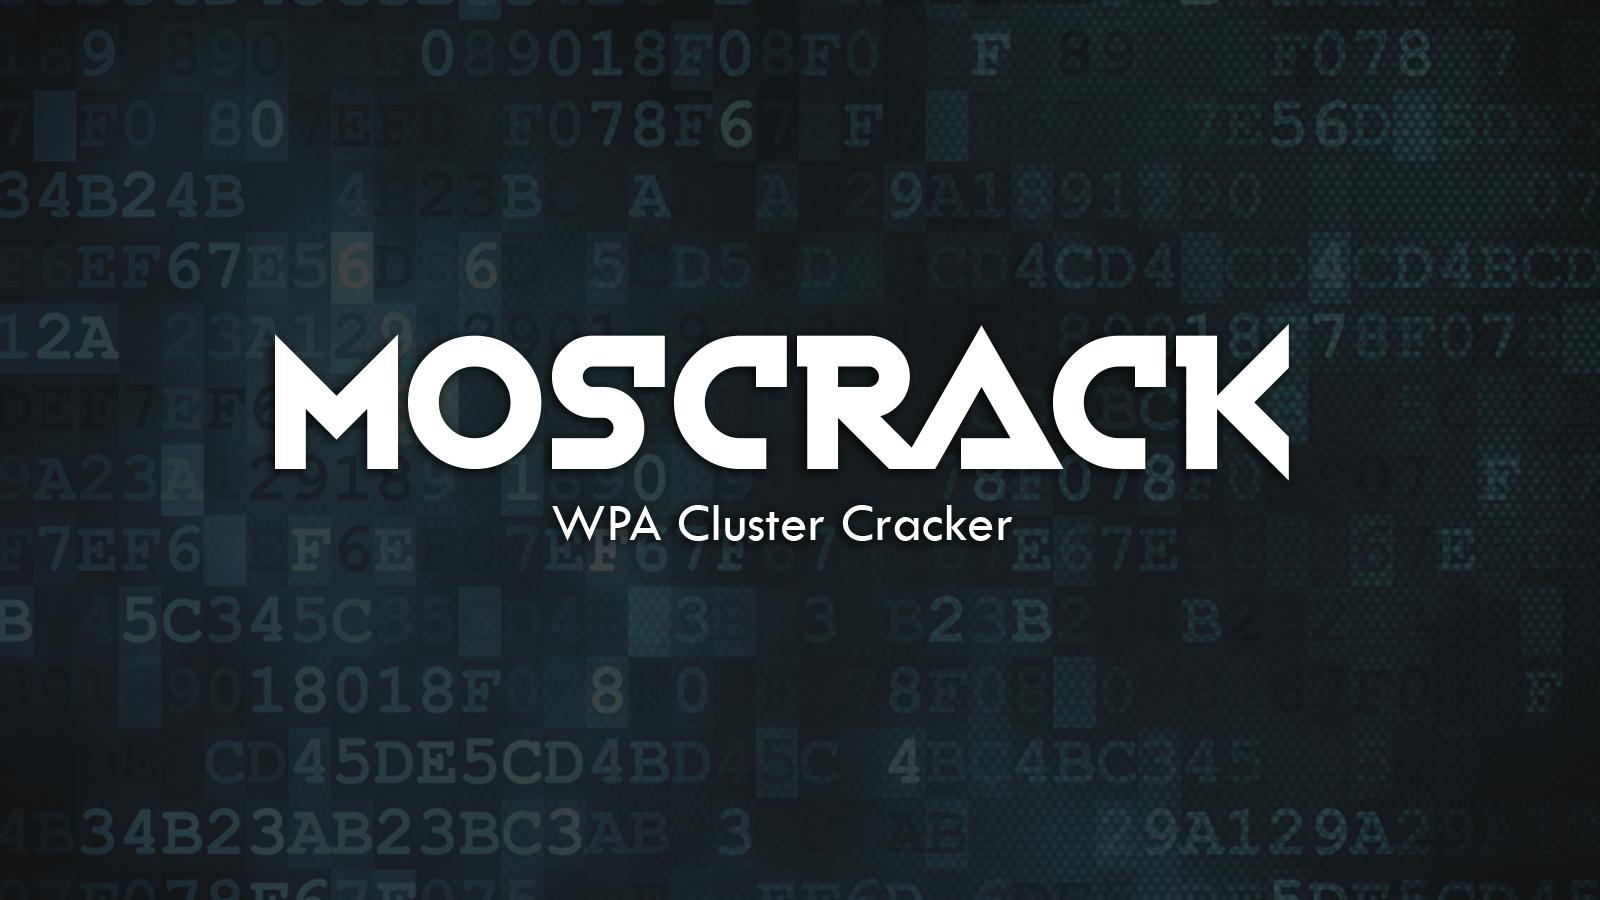 Moscrack - WPA Cluster Cracker